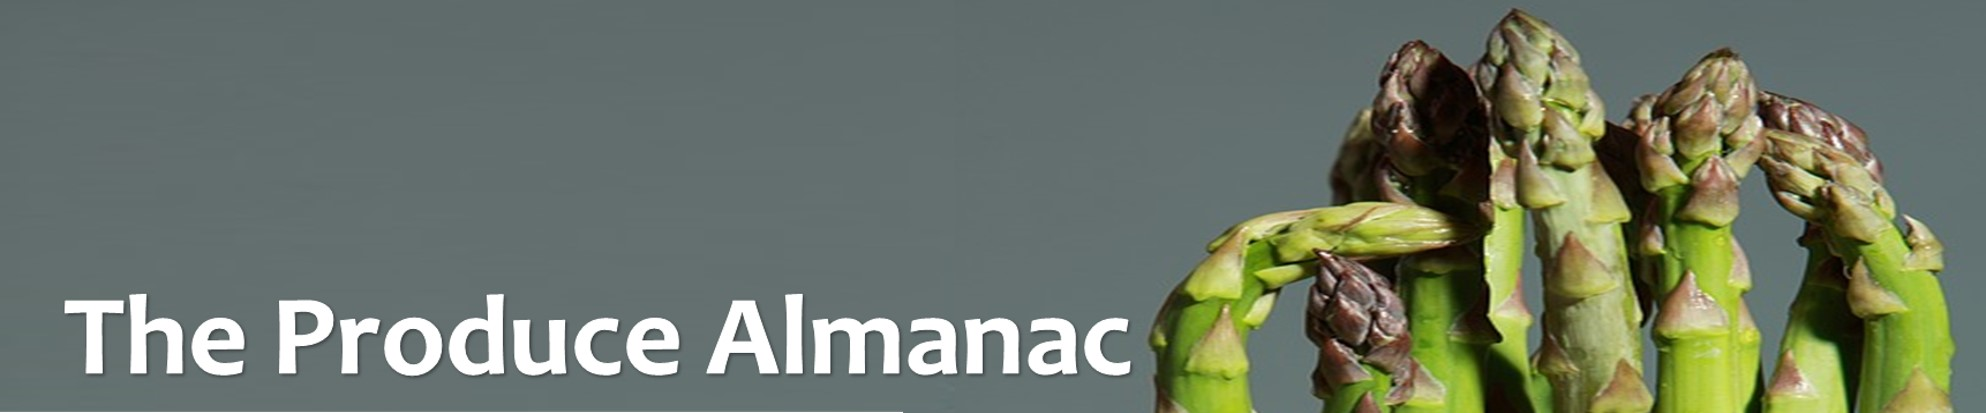 Almanac - Title